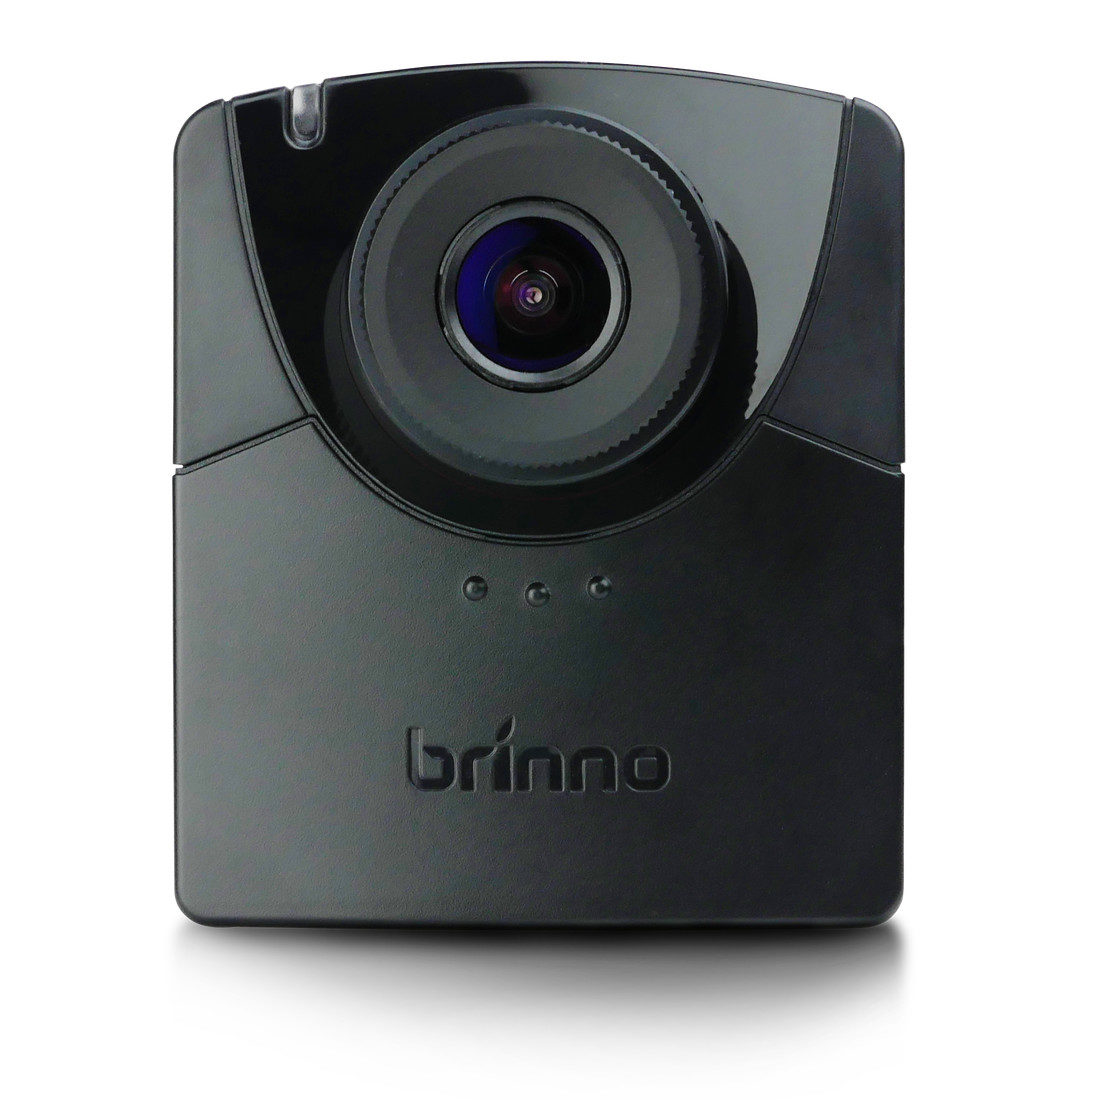 Brinno TLC2000 Timelapse Camera Zwart <br/>€ 349.00 <br/> <a href='https://www.cameranu.nl/fotografie/?tt=12190_474631_241358_&r=https%3A%2F%2Fwww.cameranu.nl%2Fnl%2Fp2927375%2Fbrinno-tlc2000-timelapse-camera-zwart%3Fchannable%3De10841.MjkyNzM3NQ%26utm_campaign%3D%26utm_content%3DTimelapse%2Bcamera%26utm_source%3DTradetracker%26utm_medium%3Dcpc%26utm_term%3DDigitale%2Bcamera%26apos%3Bs' target='_blank'>naar de winkel</a>